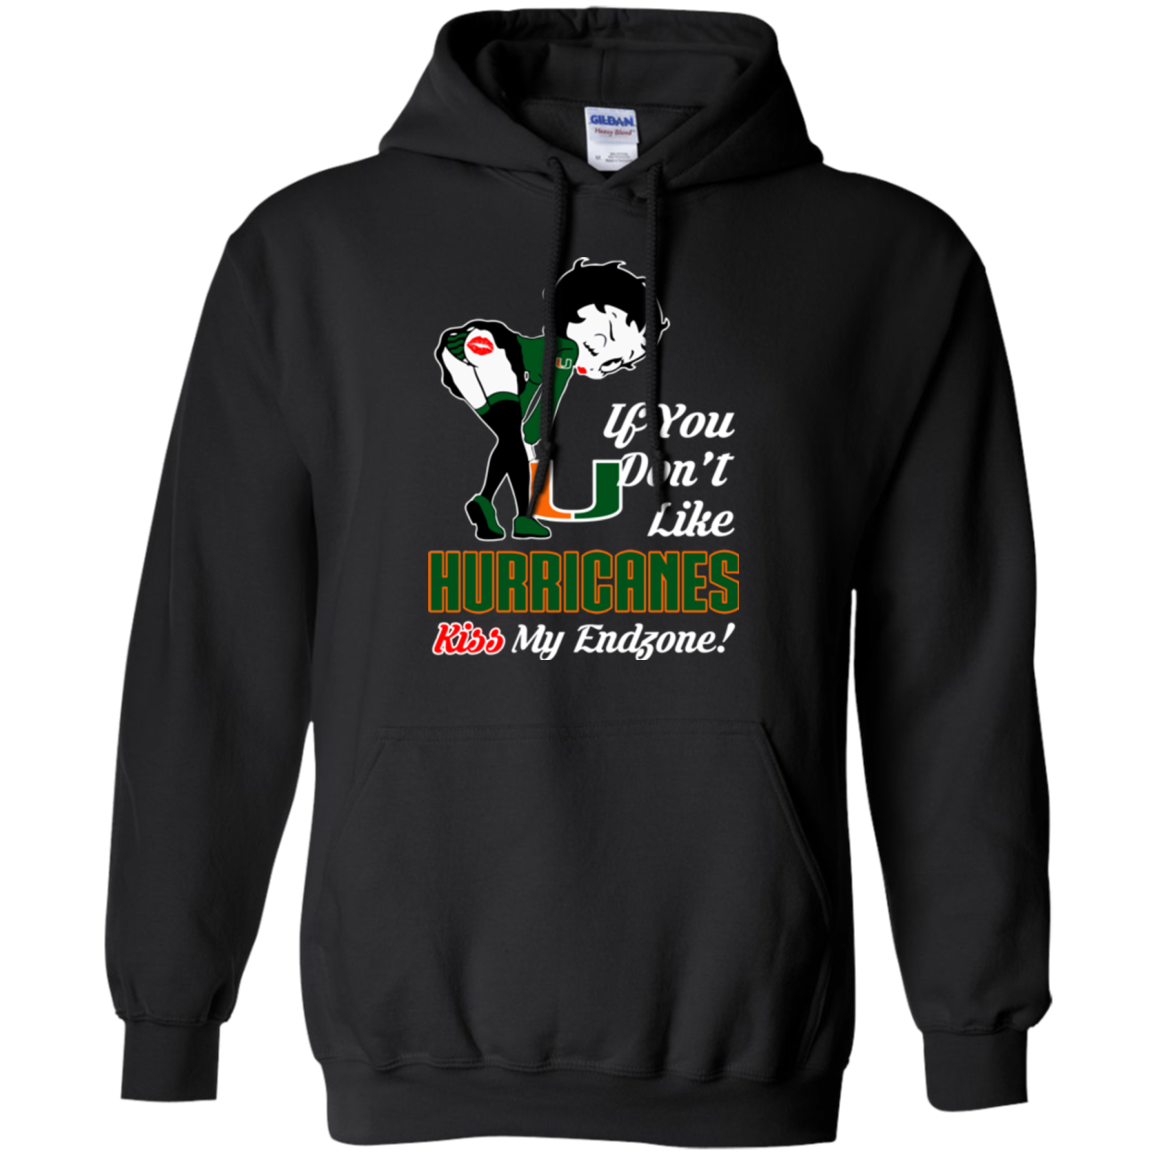 Betty Boop Miami (FL) Hurricanes T shirts If You Don't Like Kiss My Endzone Hoodies Sweatshirts